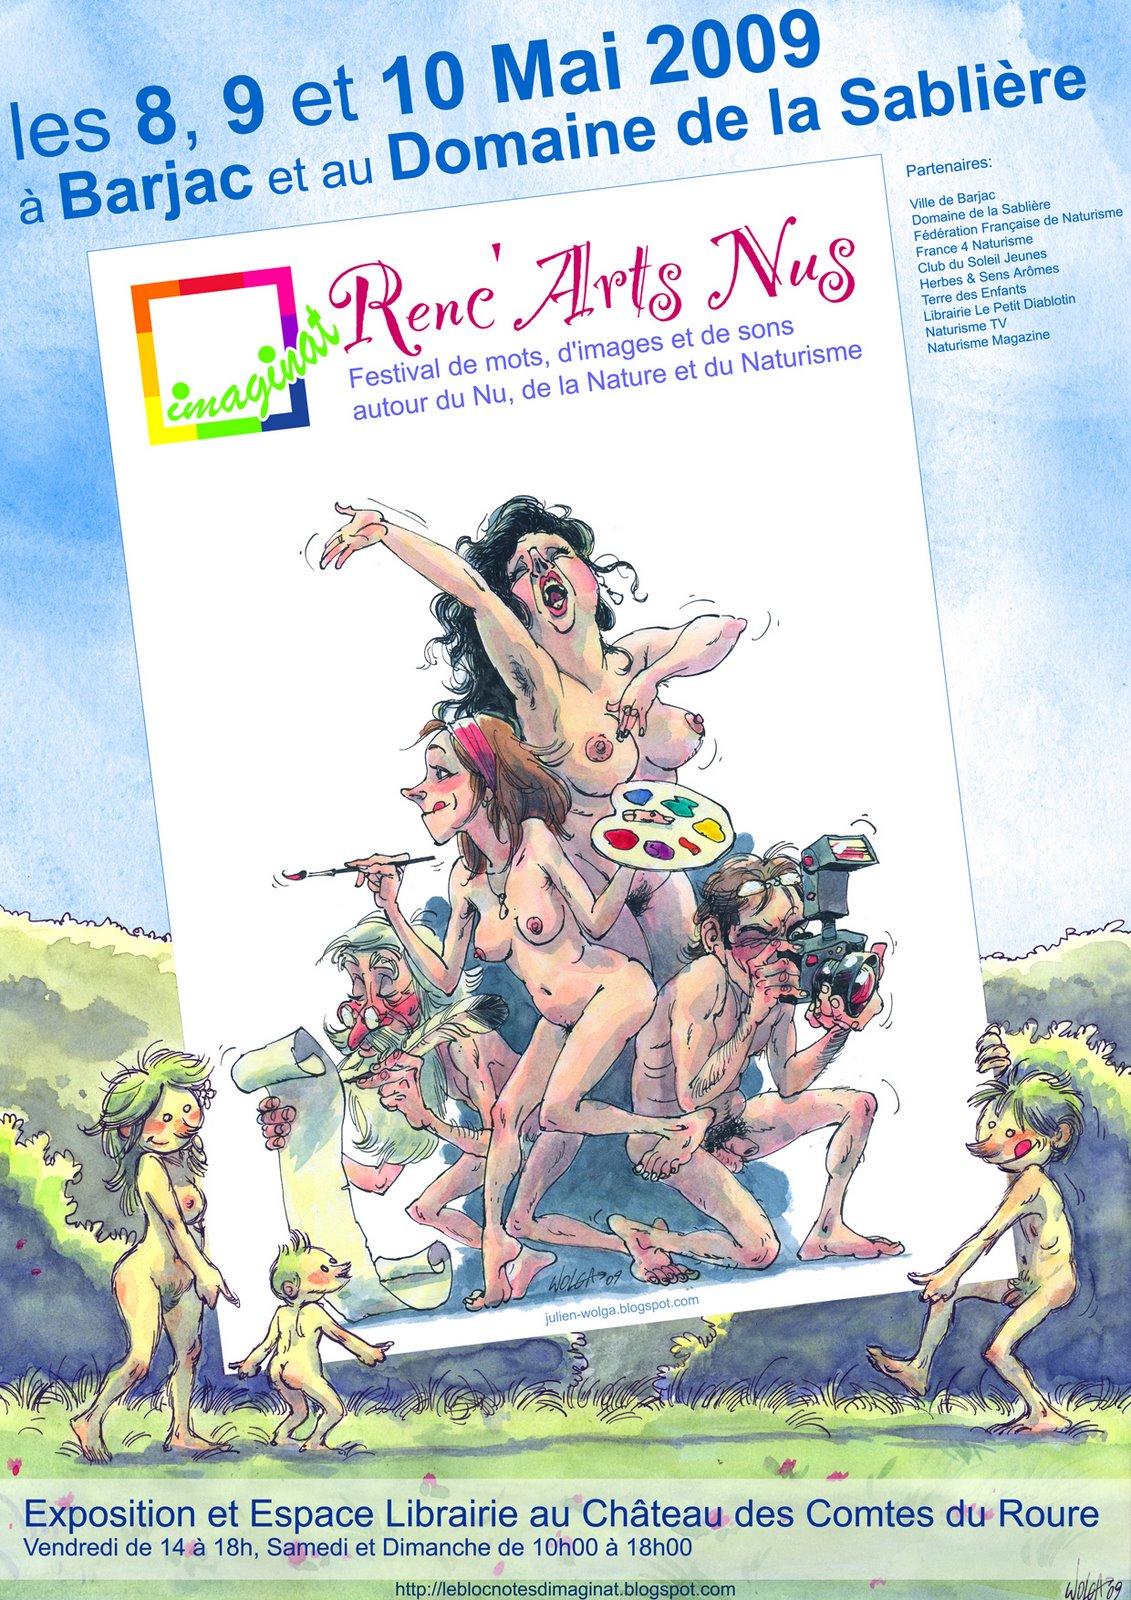 affiche-renc-arts-nus-sabli%C3%A8re-A4-150dpi.jpg